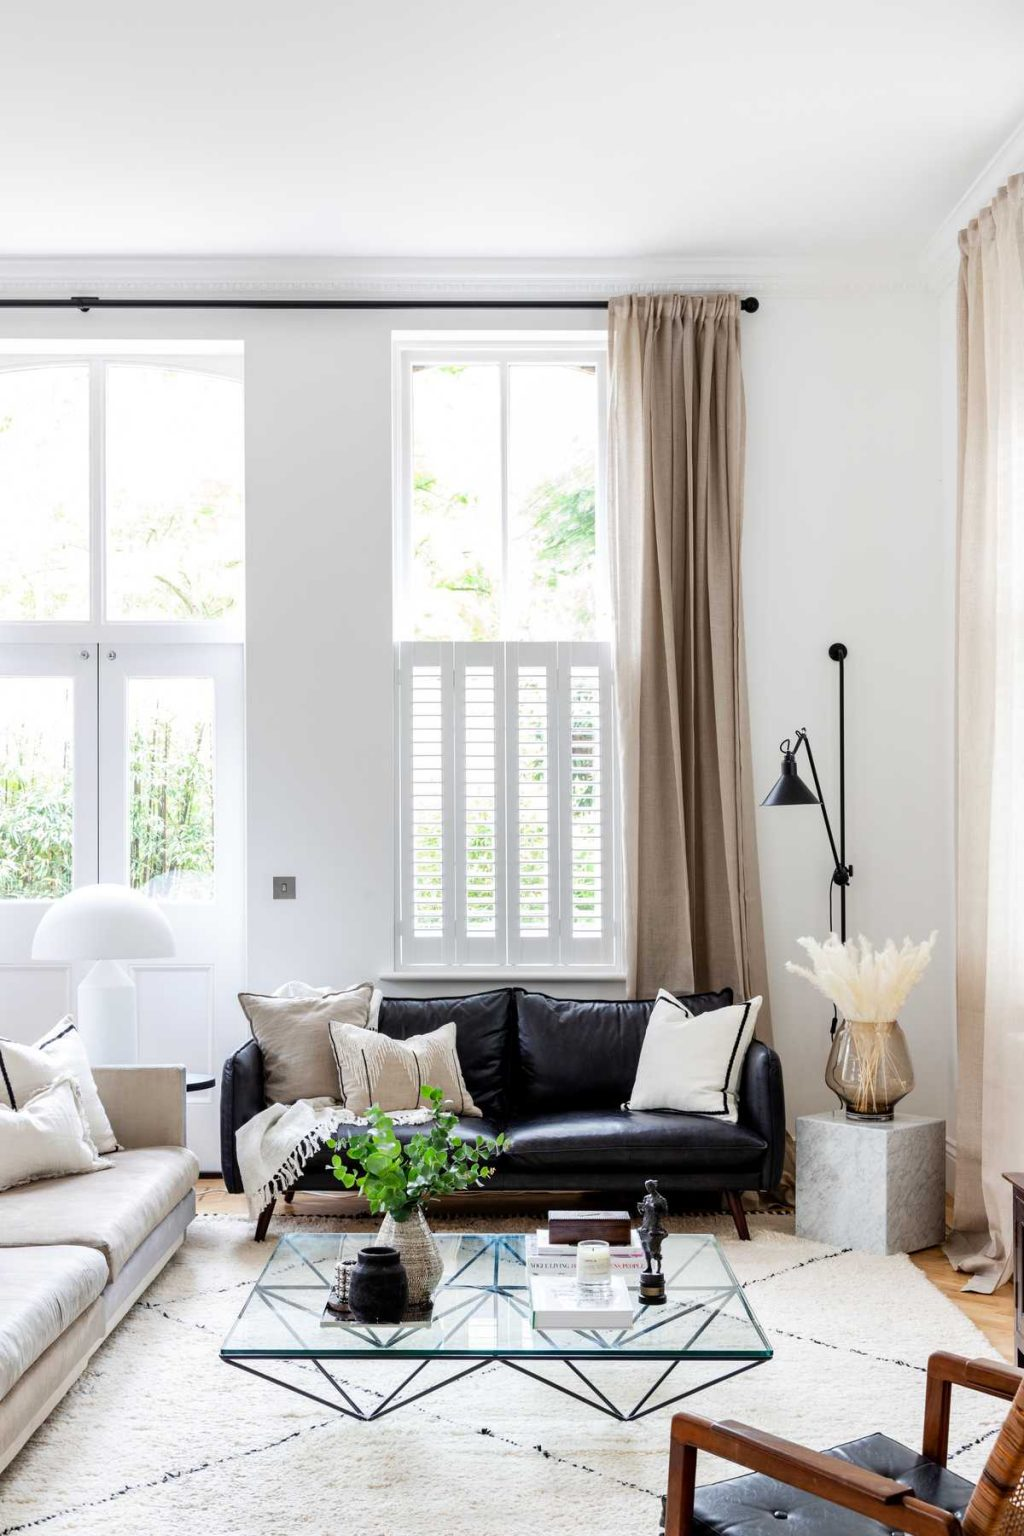 Interior renovation by Covet & Noir